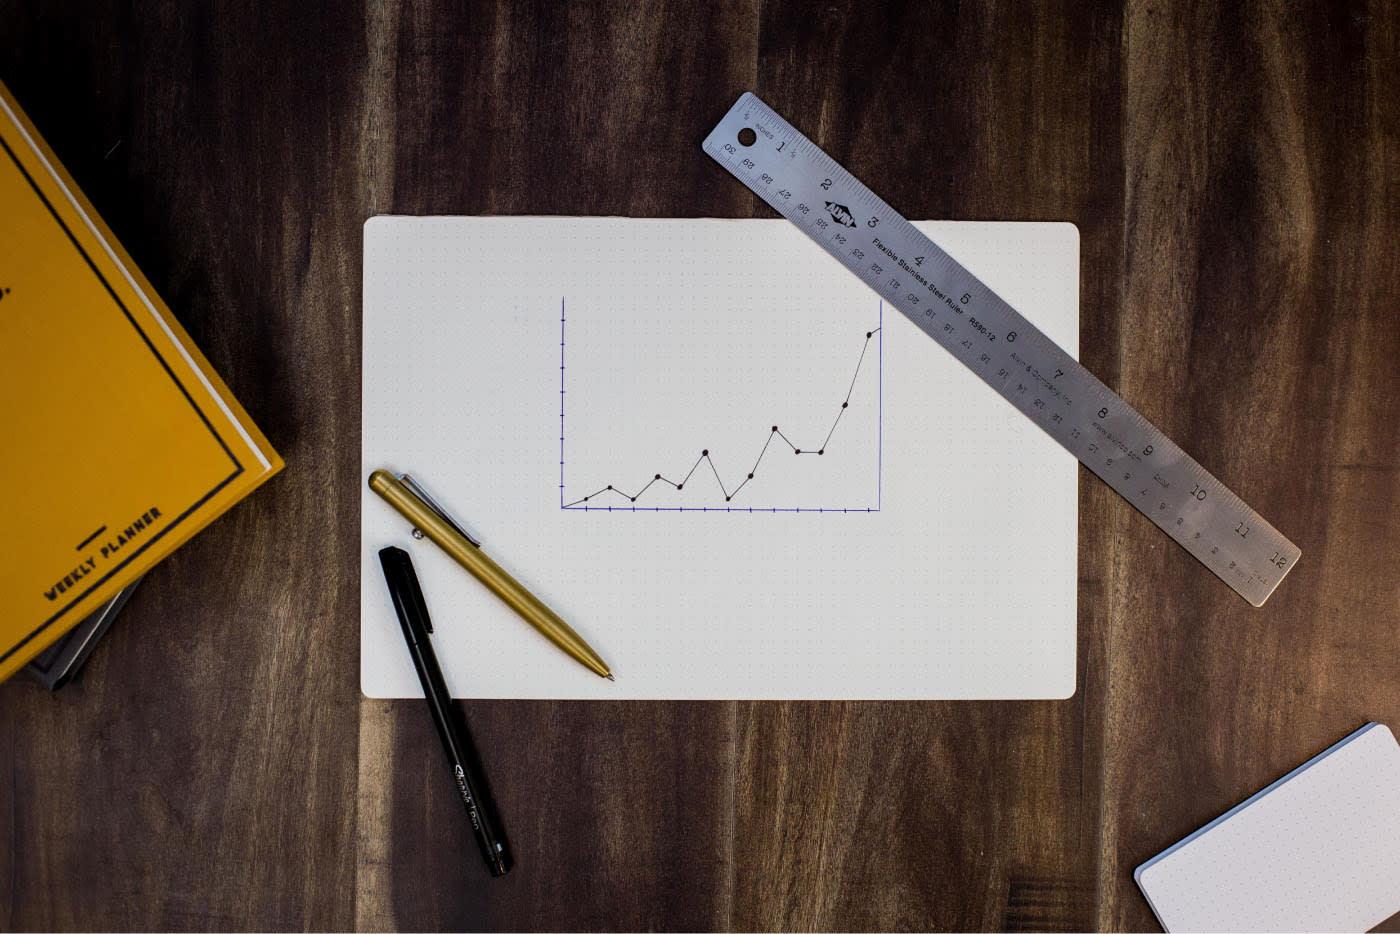 Making Progress With Progress Indicators: Part 2